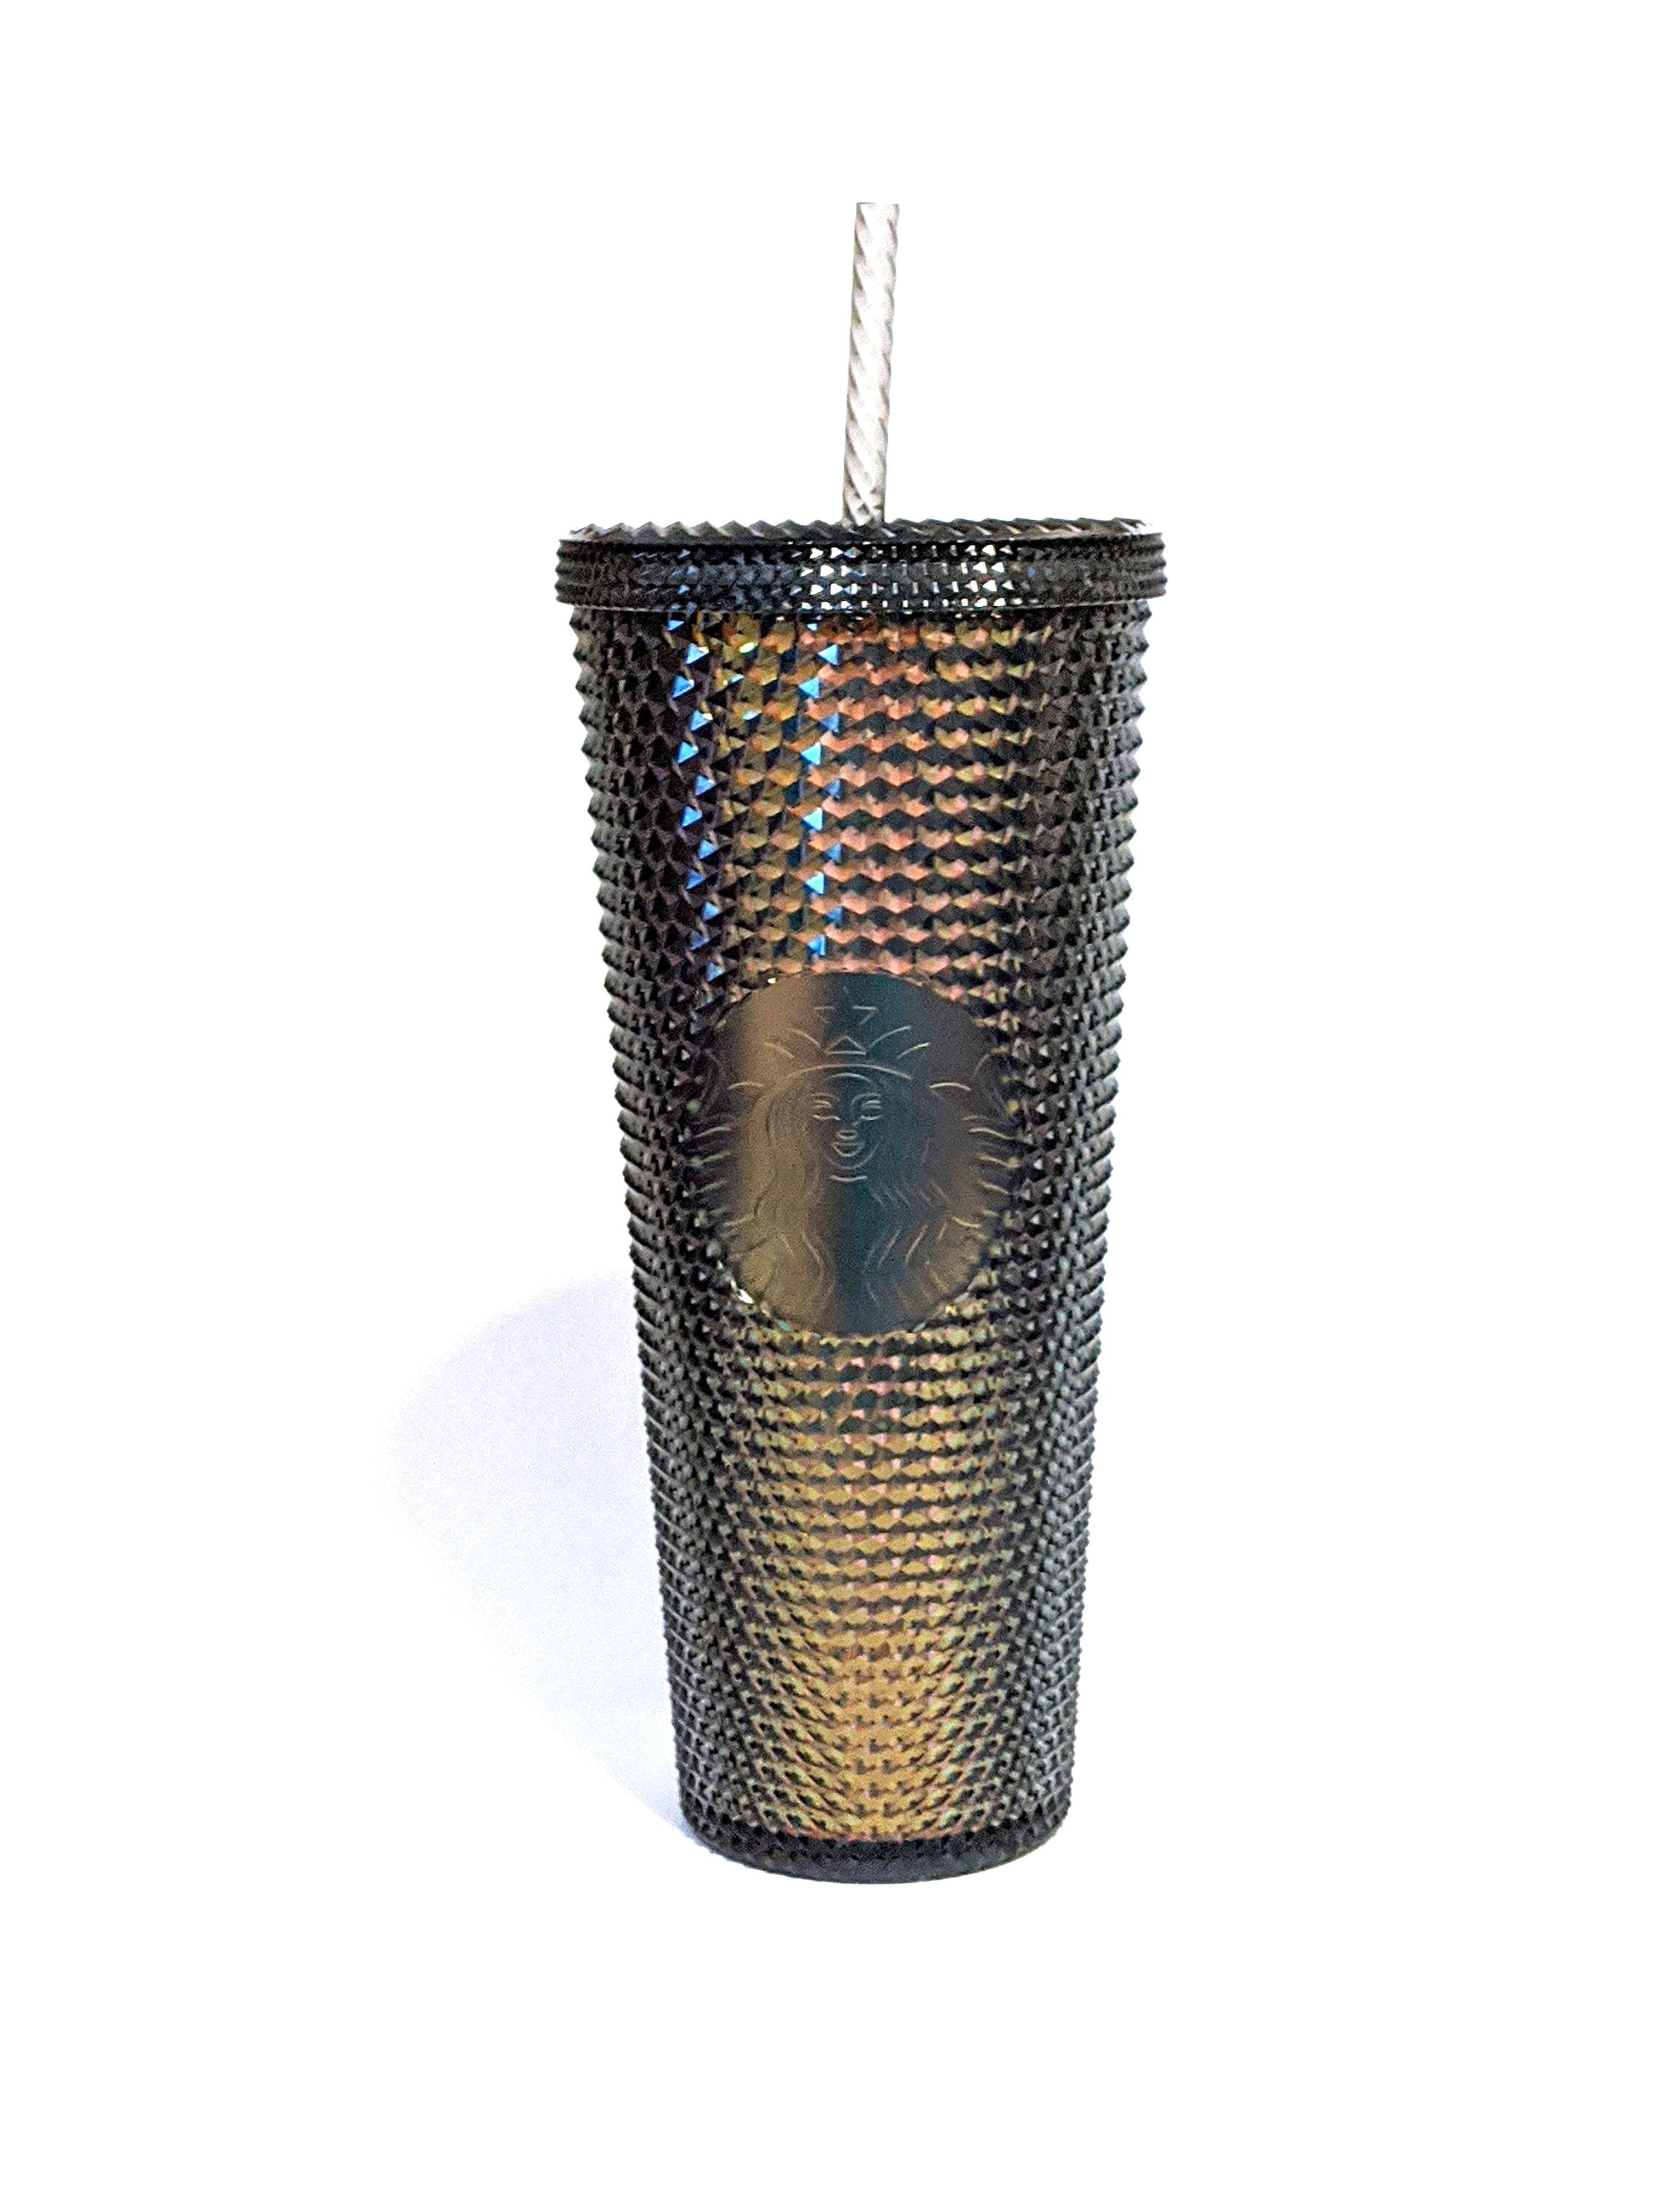 New Starbucks Studded Black Iridescent Cold Cup Tumbler 24oz Fall 2020 Fall